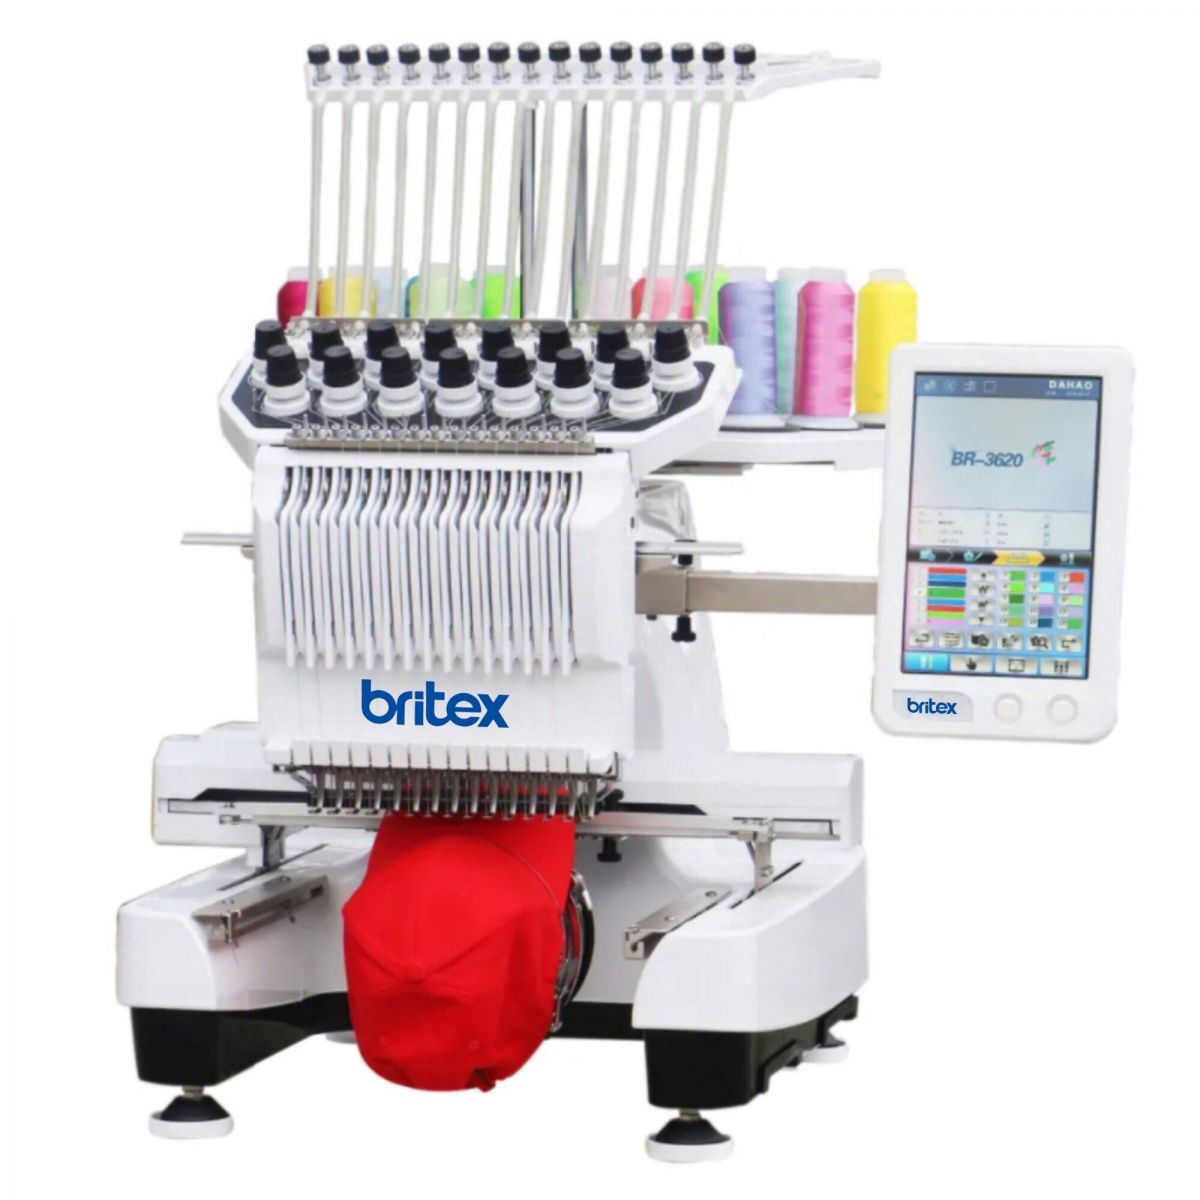 BR-3620 New Type Single Head 15 Needles Dahao New A15 Computerized Embroidery Machine - Hiệu Britex, Model: BR-3260